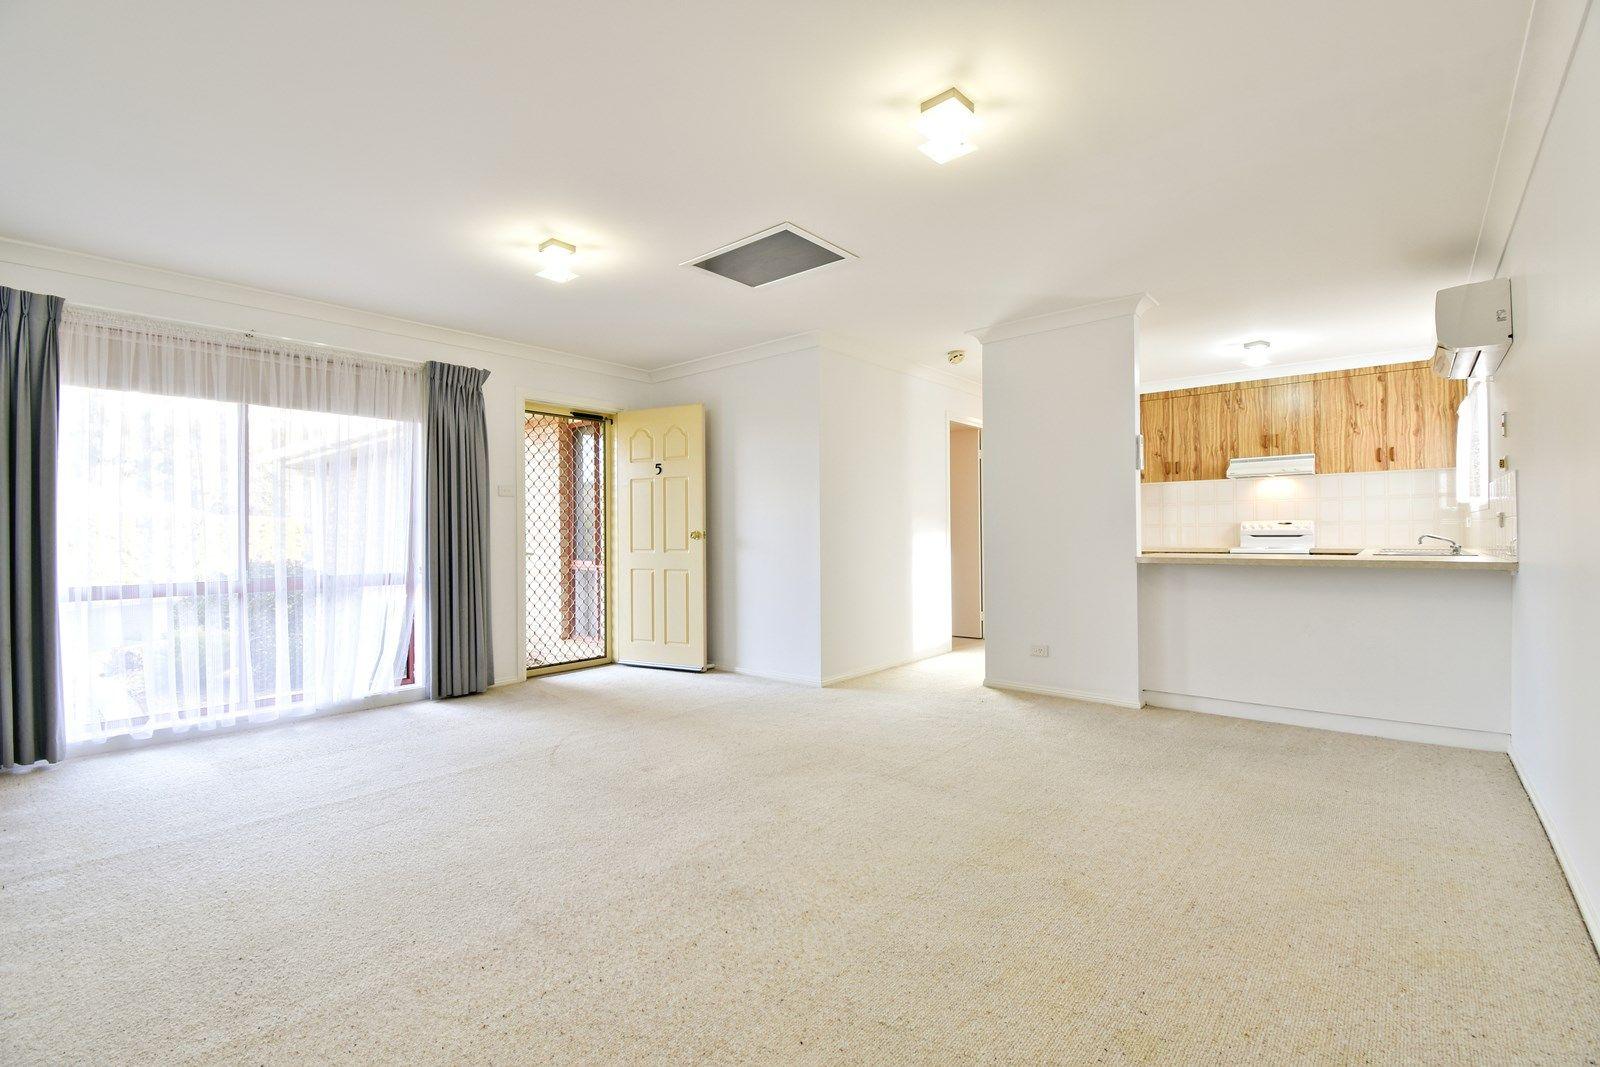 5/71 Baird  Drive, Dubbo NSW 2830, Image 1